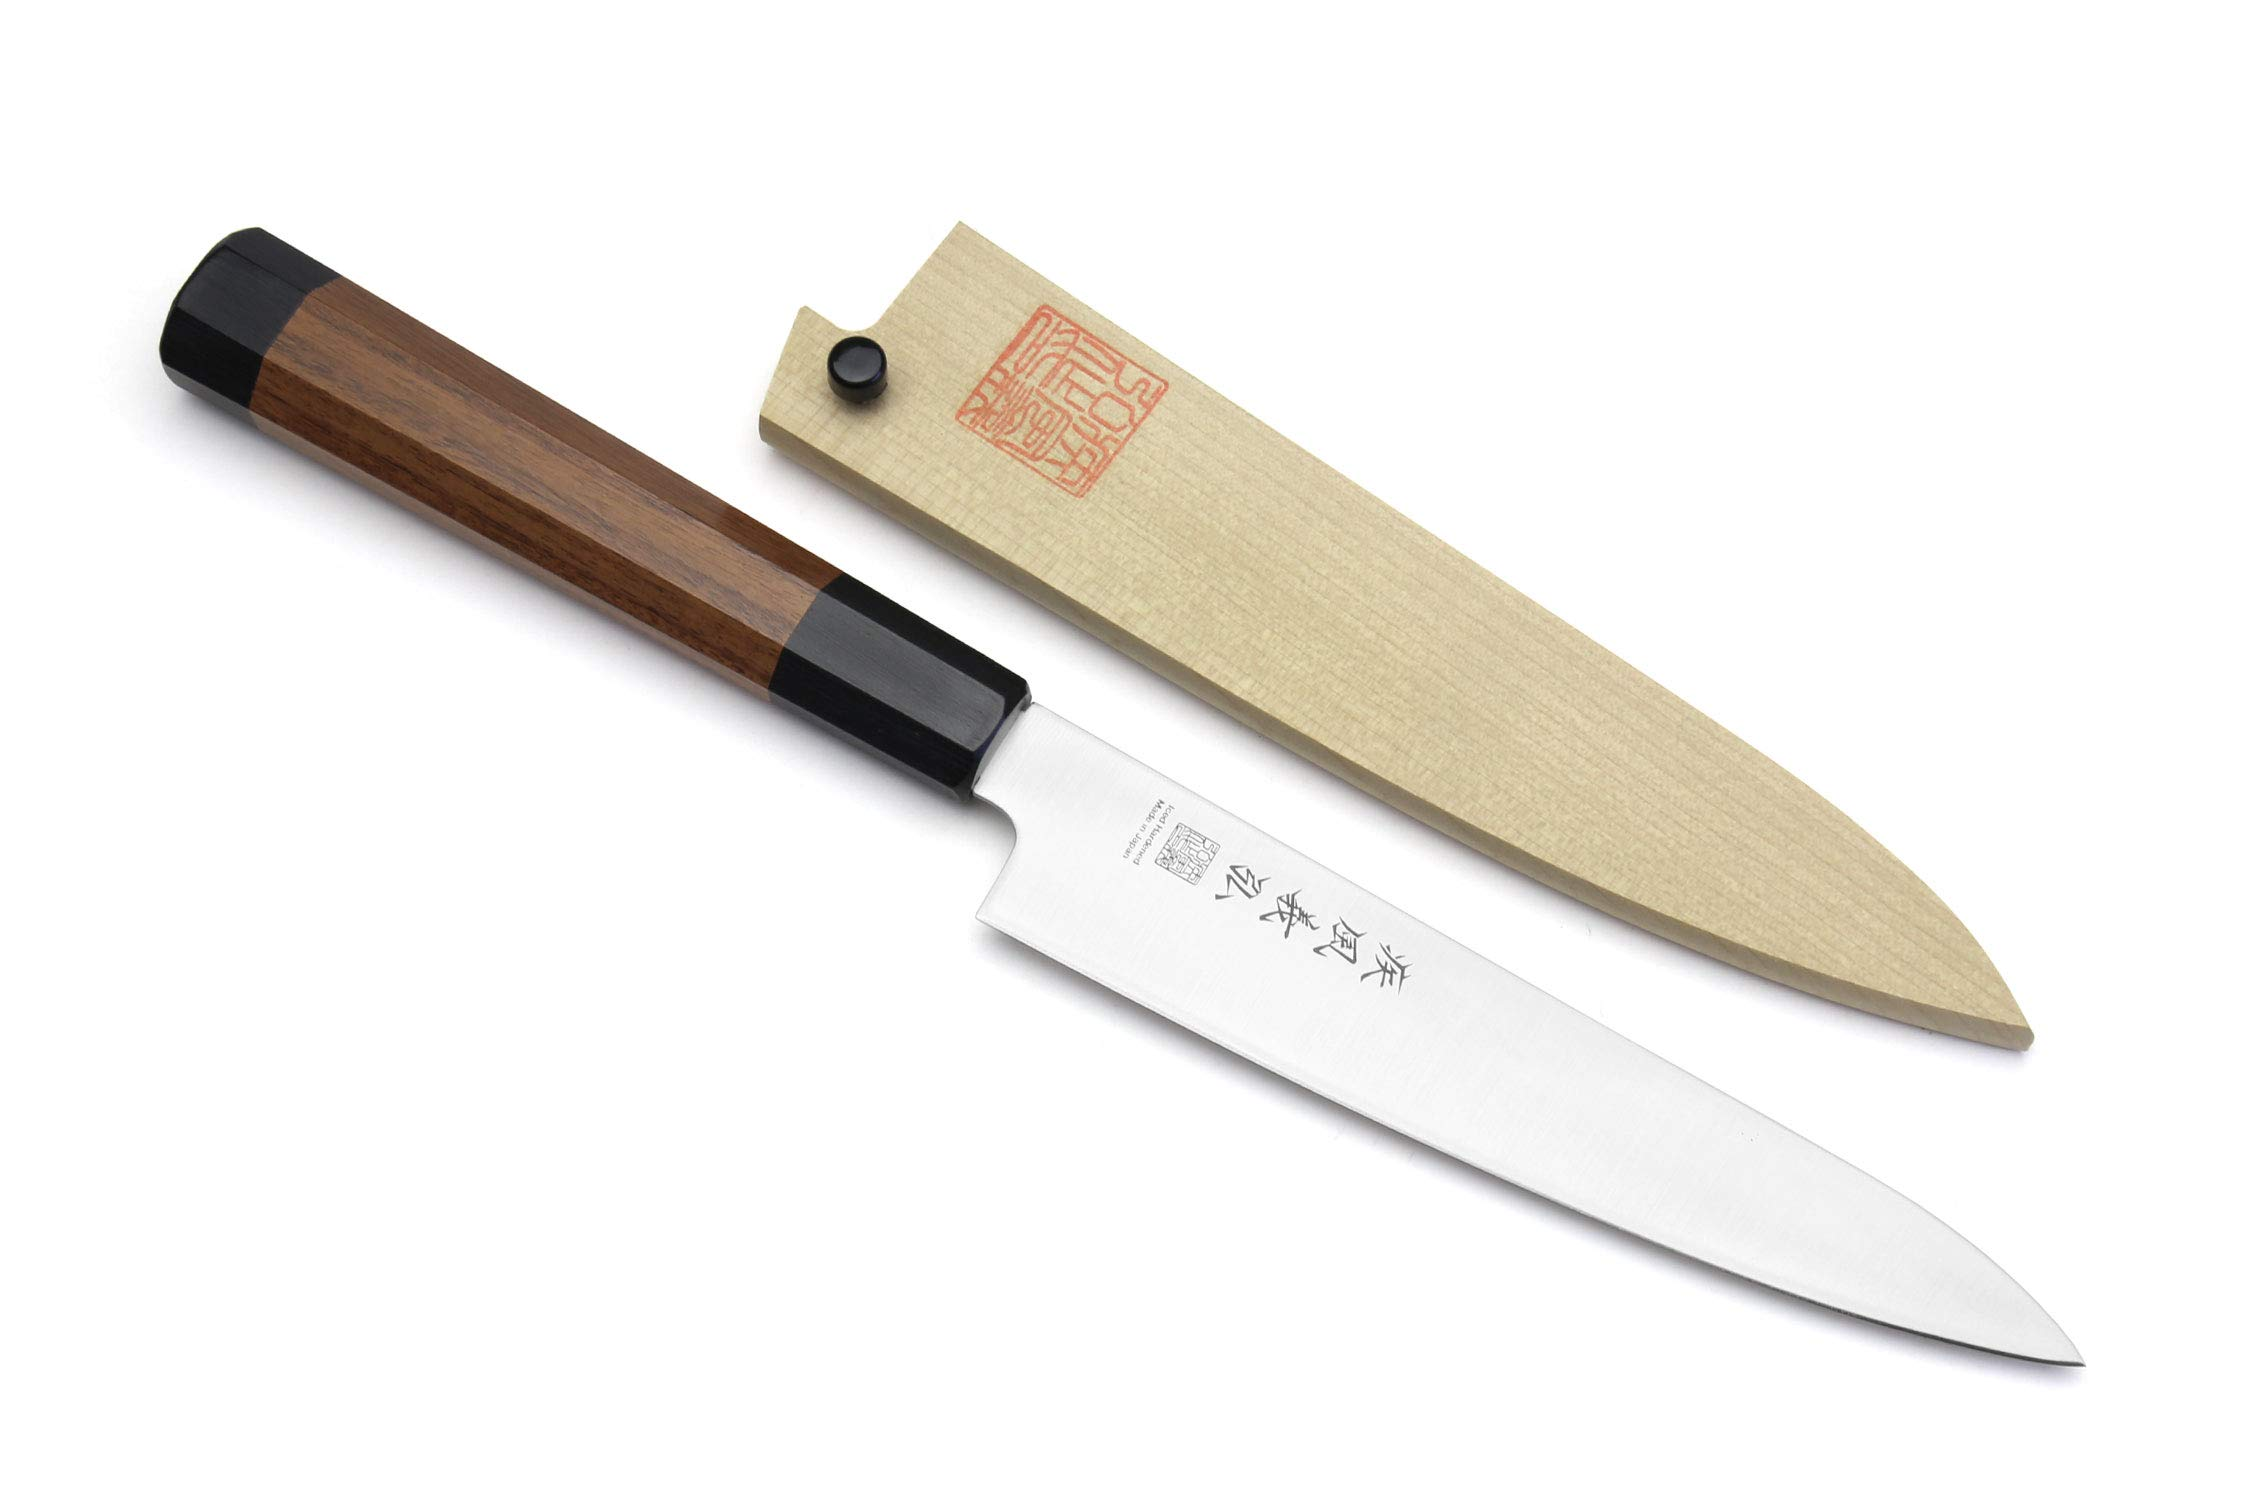 Yoshihiro Inox Stain-resistant Aus-10 Steel Ice Hardened Petty Utility knife Shitan Handle 6'' (150mm)